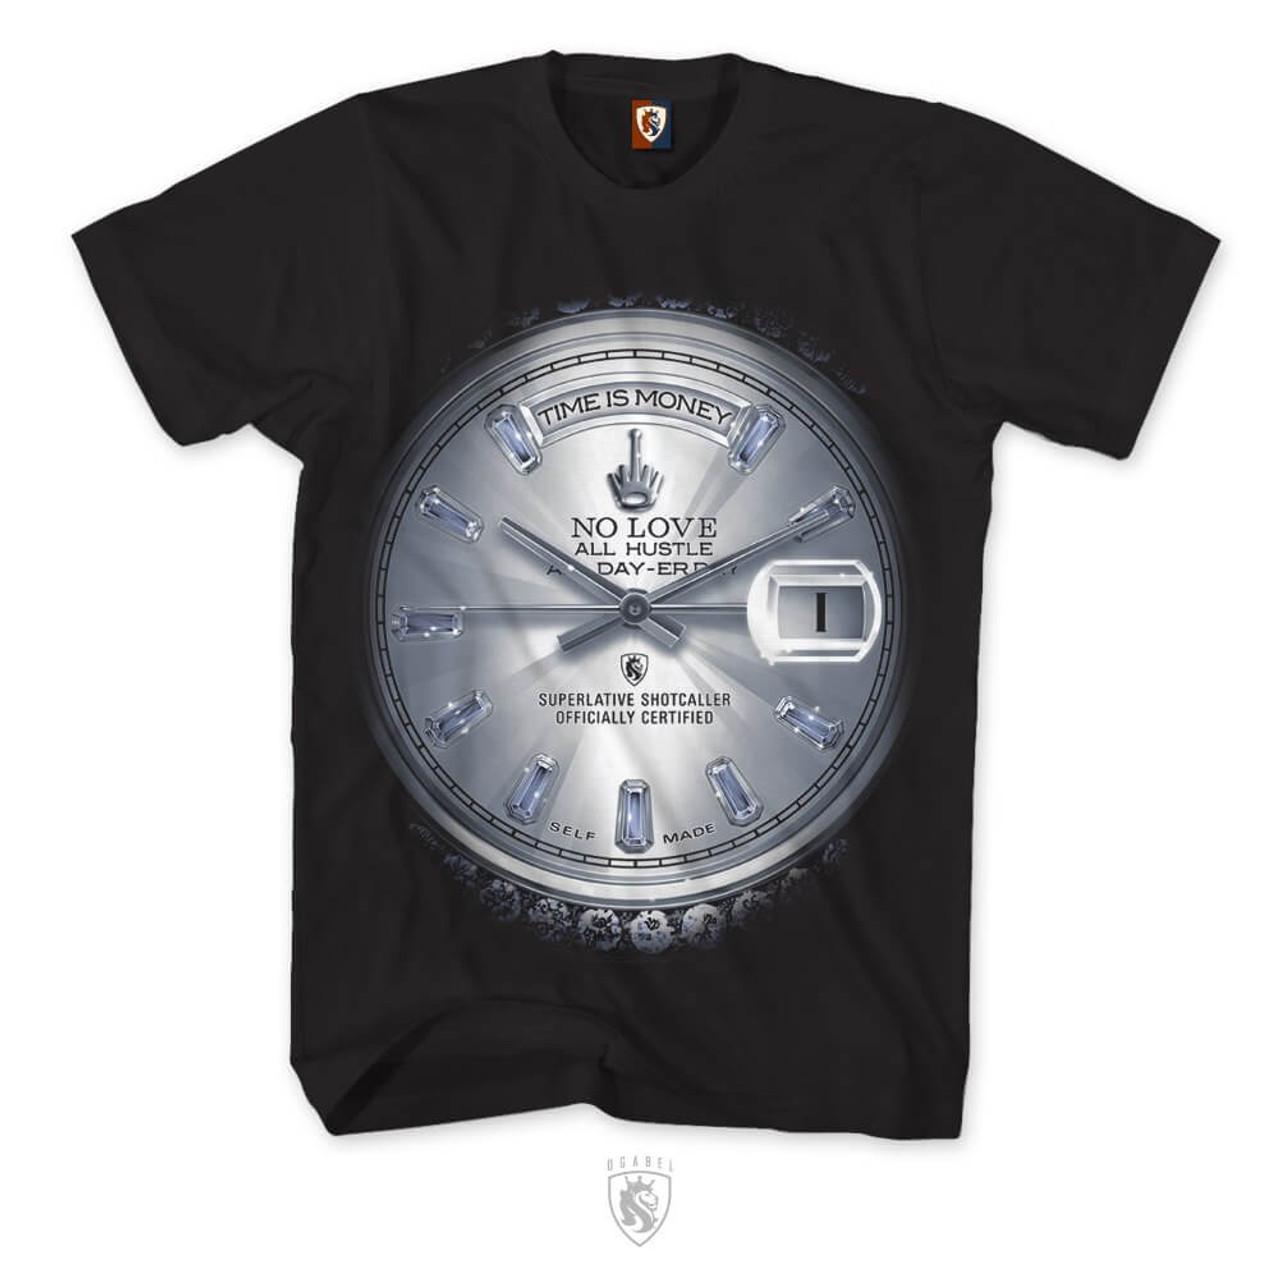 Time is Money - Platinum edition